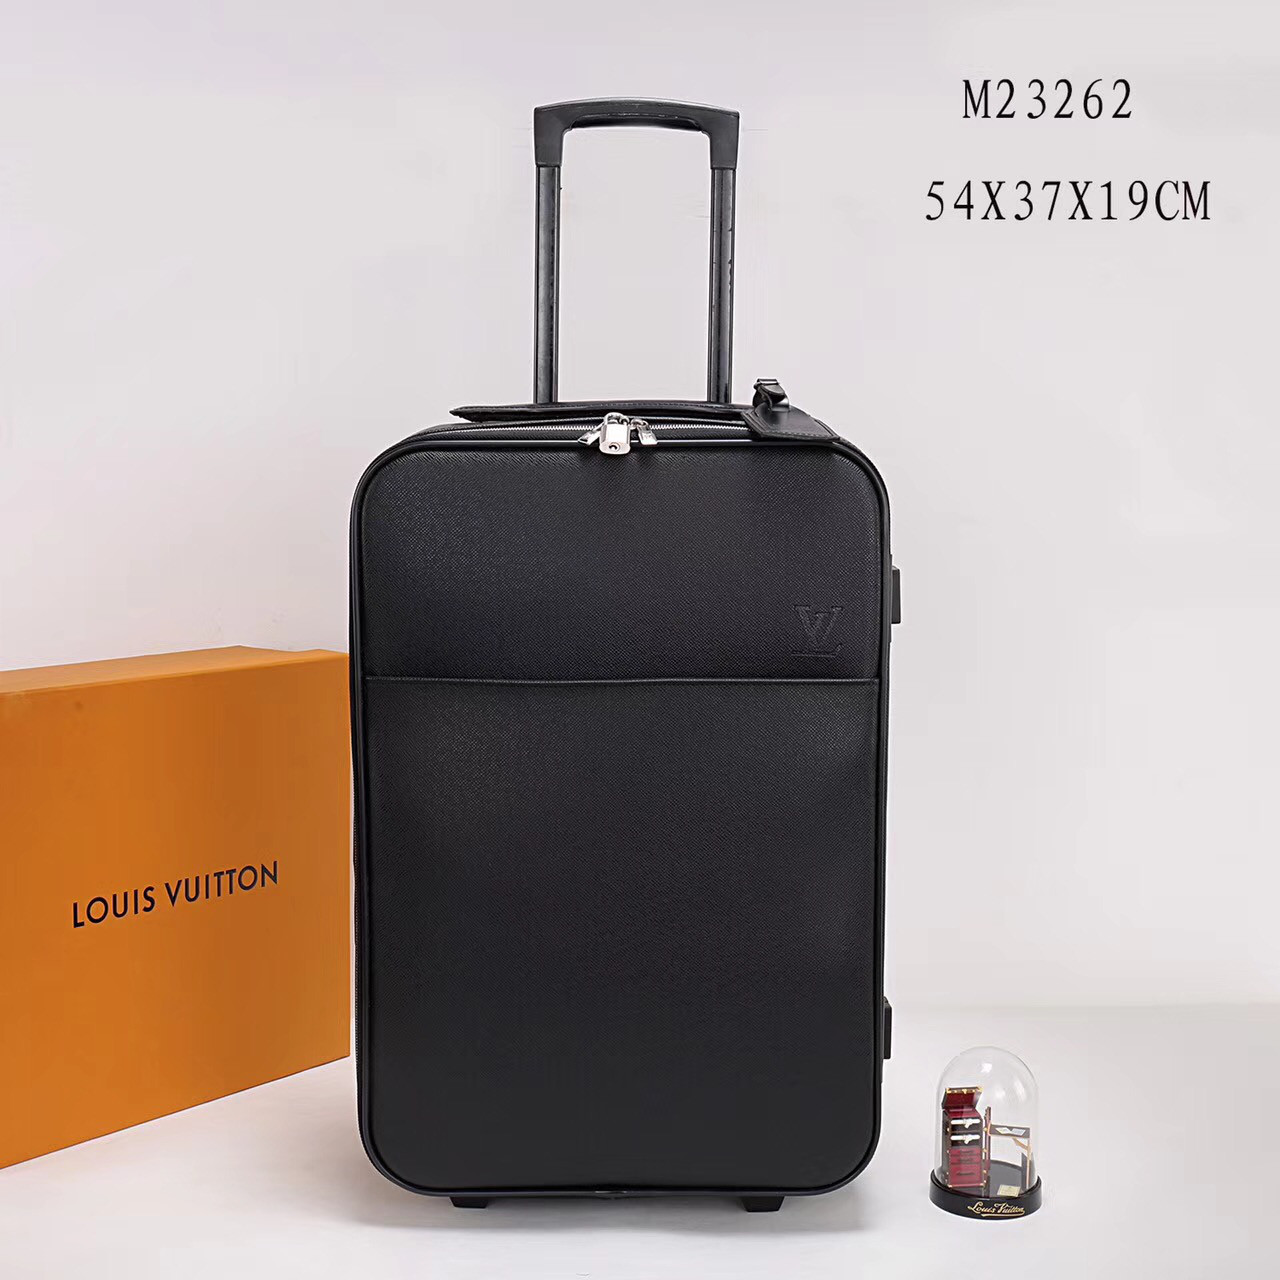 Багаж на колесах Louis Vuitton